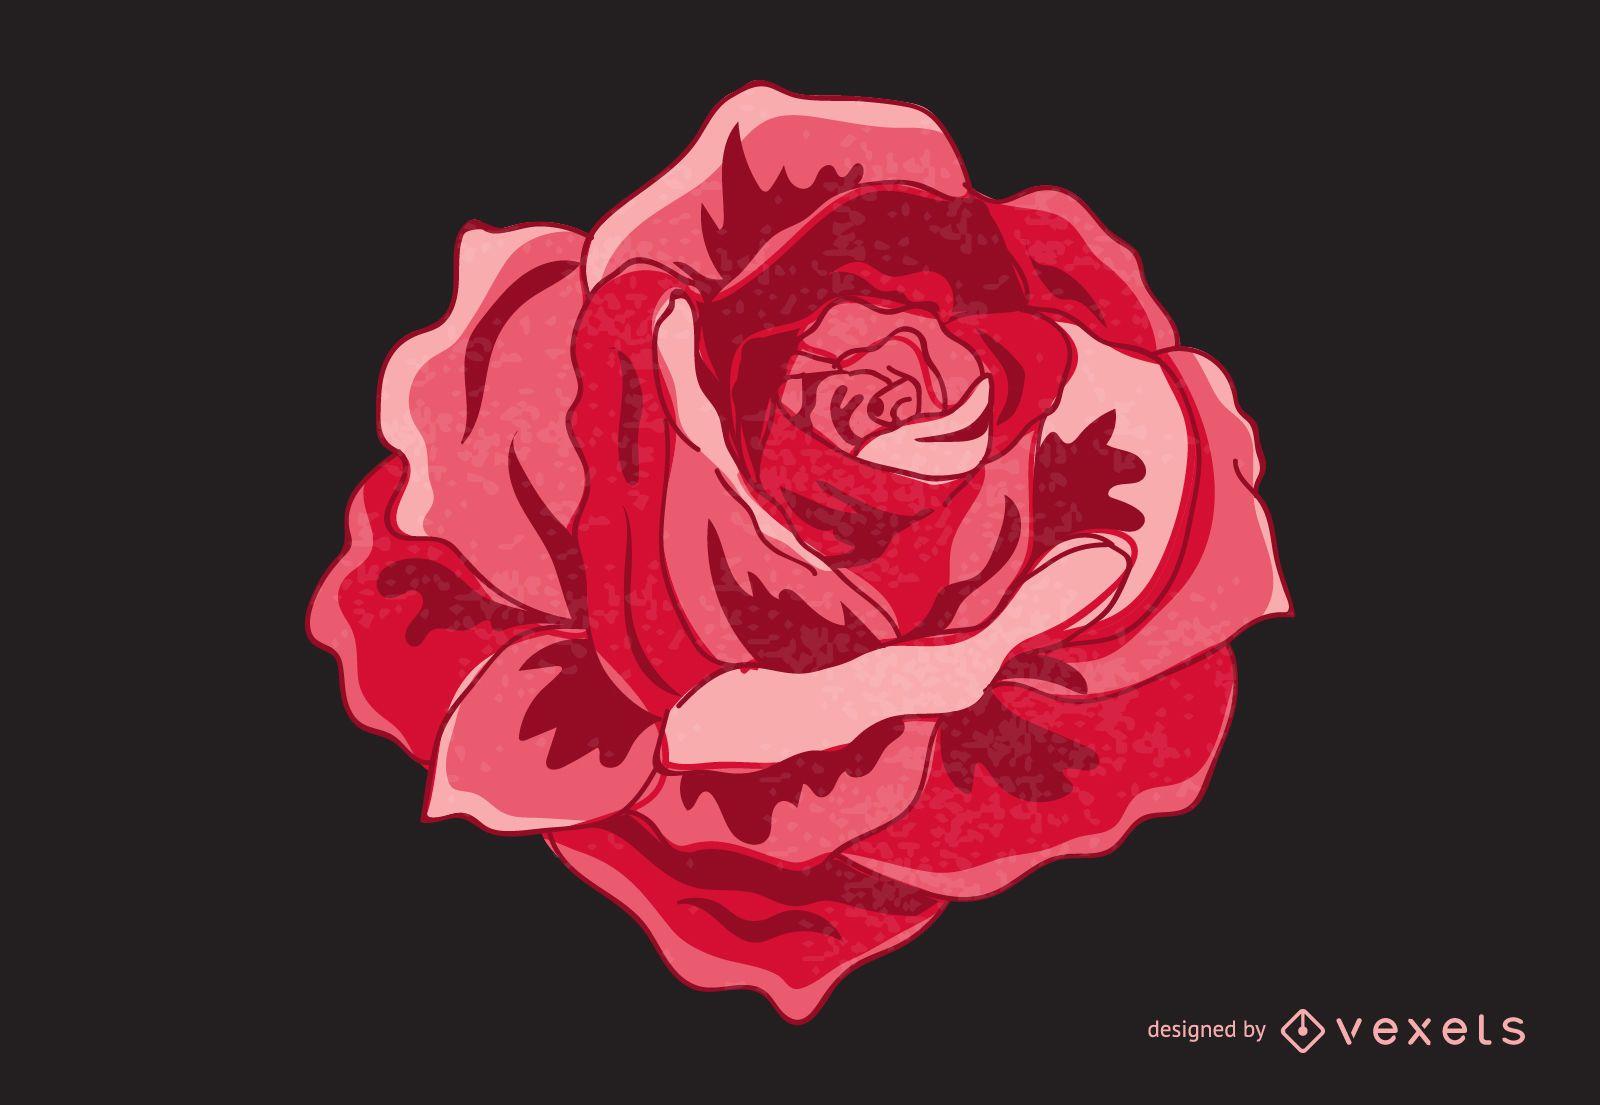 Isolated vintage rose illustration